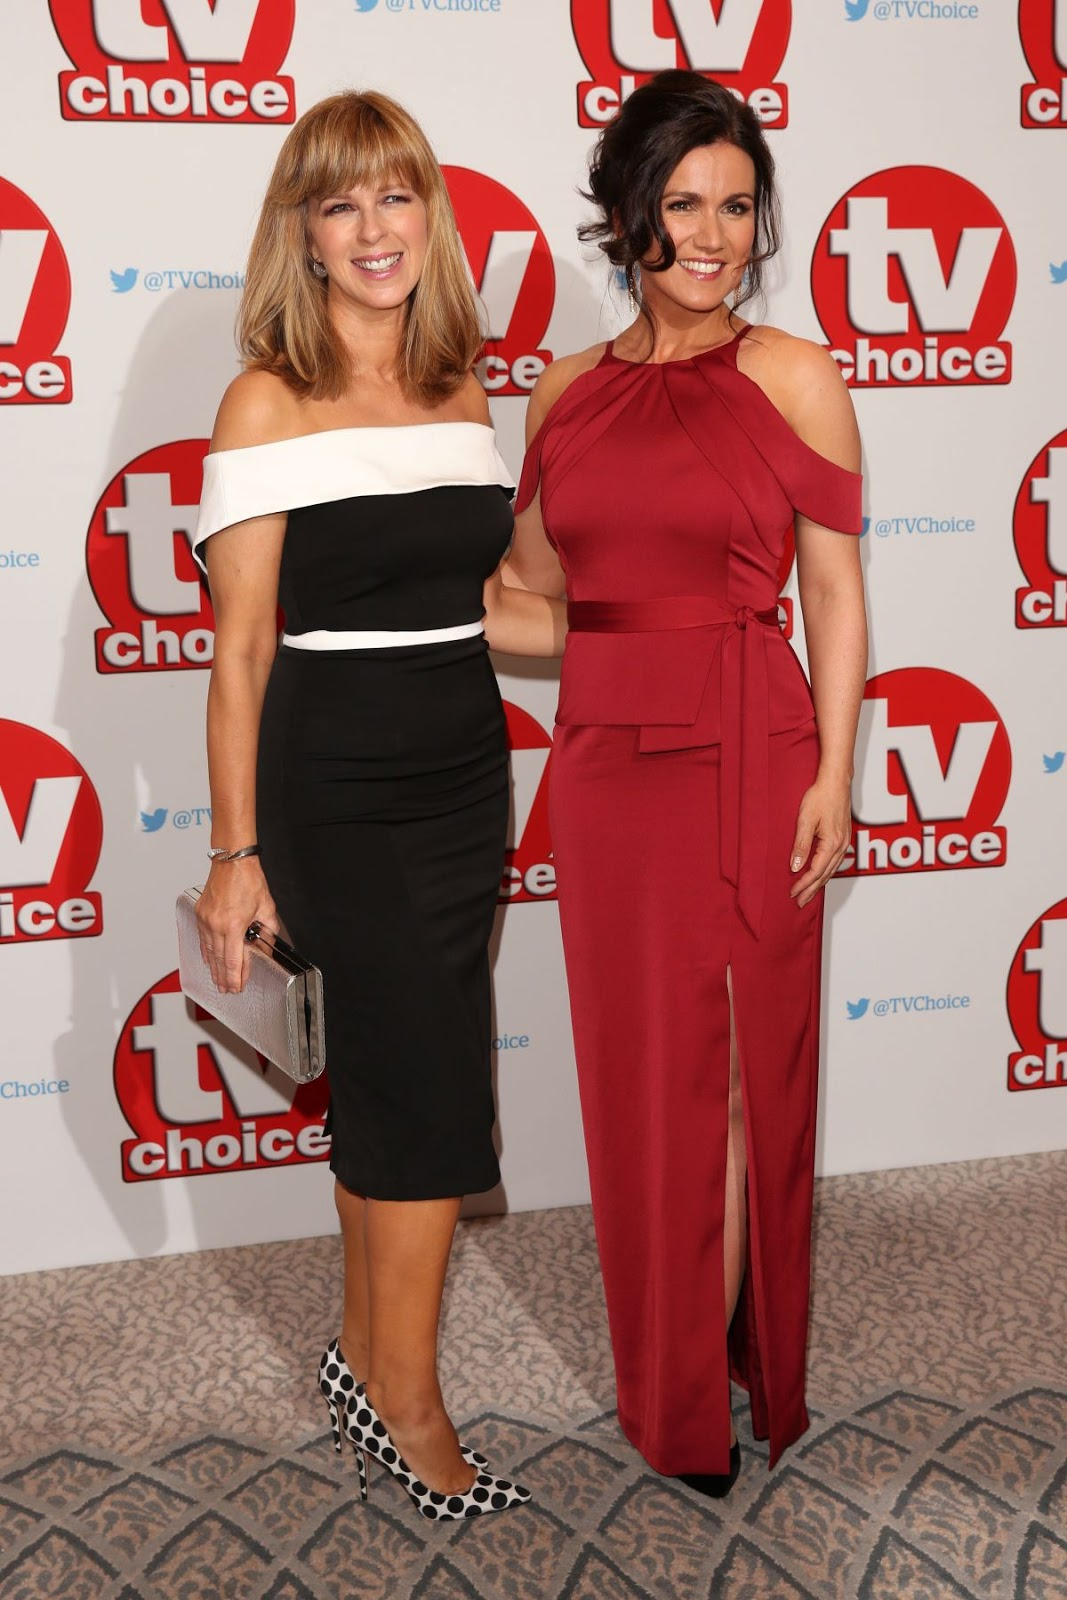 HQ Photos of 'BBC Breakfast' presenter Susanna Reid at TV Choice Awards in London